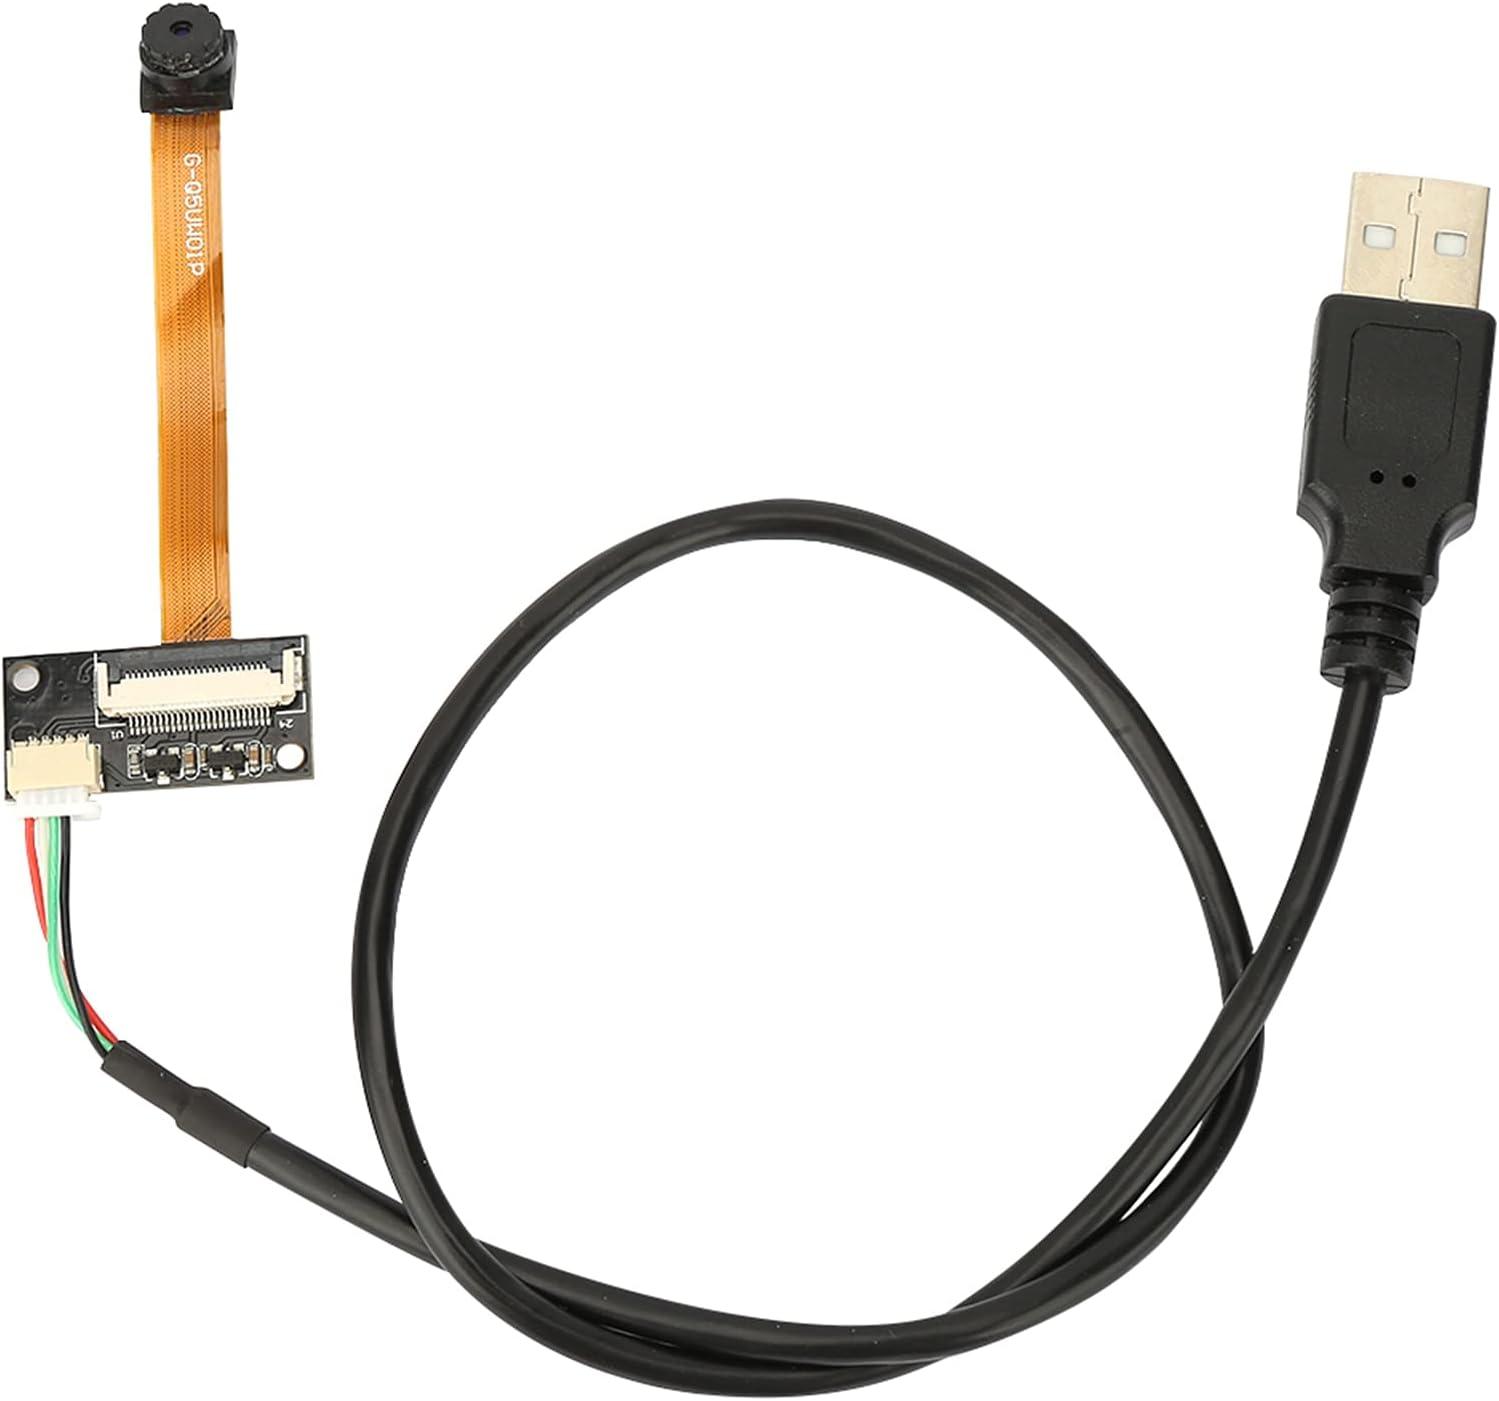 Mini Max 76% OFF Max 59% OFF USB Camera Module 5 Million 60° Angle Pixels Lens Wide